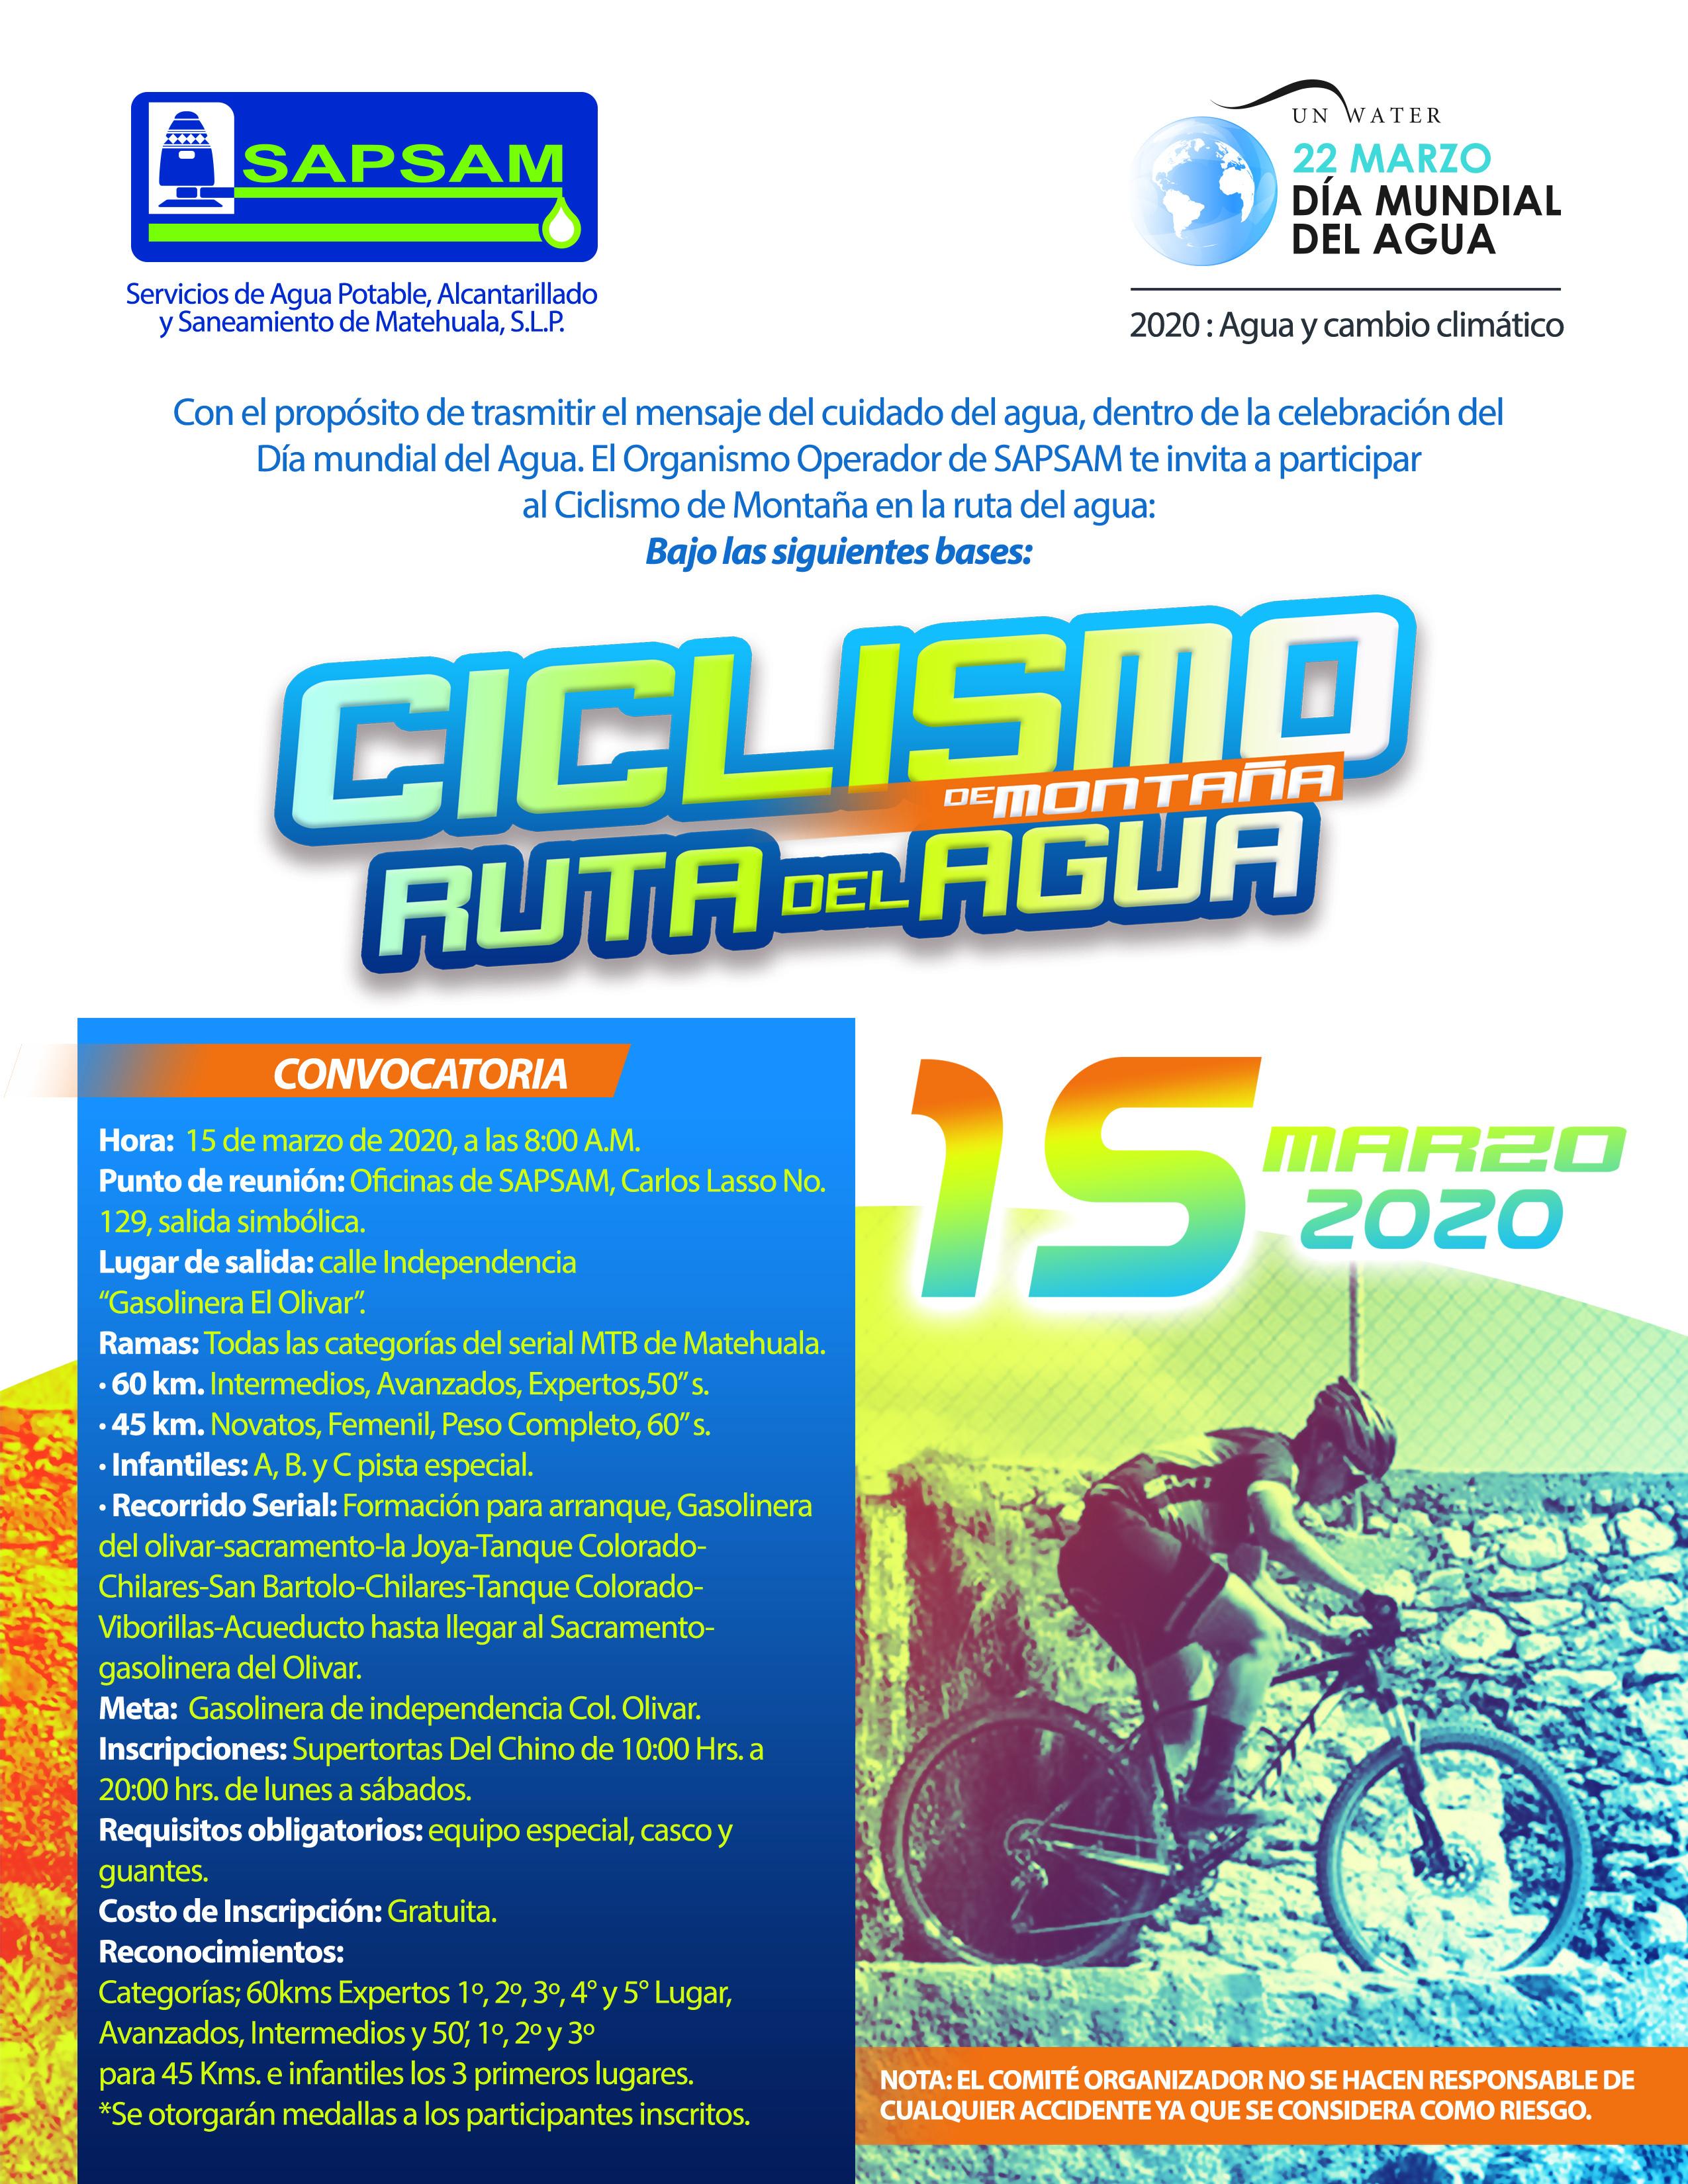 https://0201.nccdn.net/4_2/000/000/083/d1a/convocatoria-ciclismo-sapsam-2550x3300.jpg